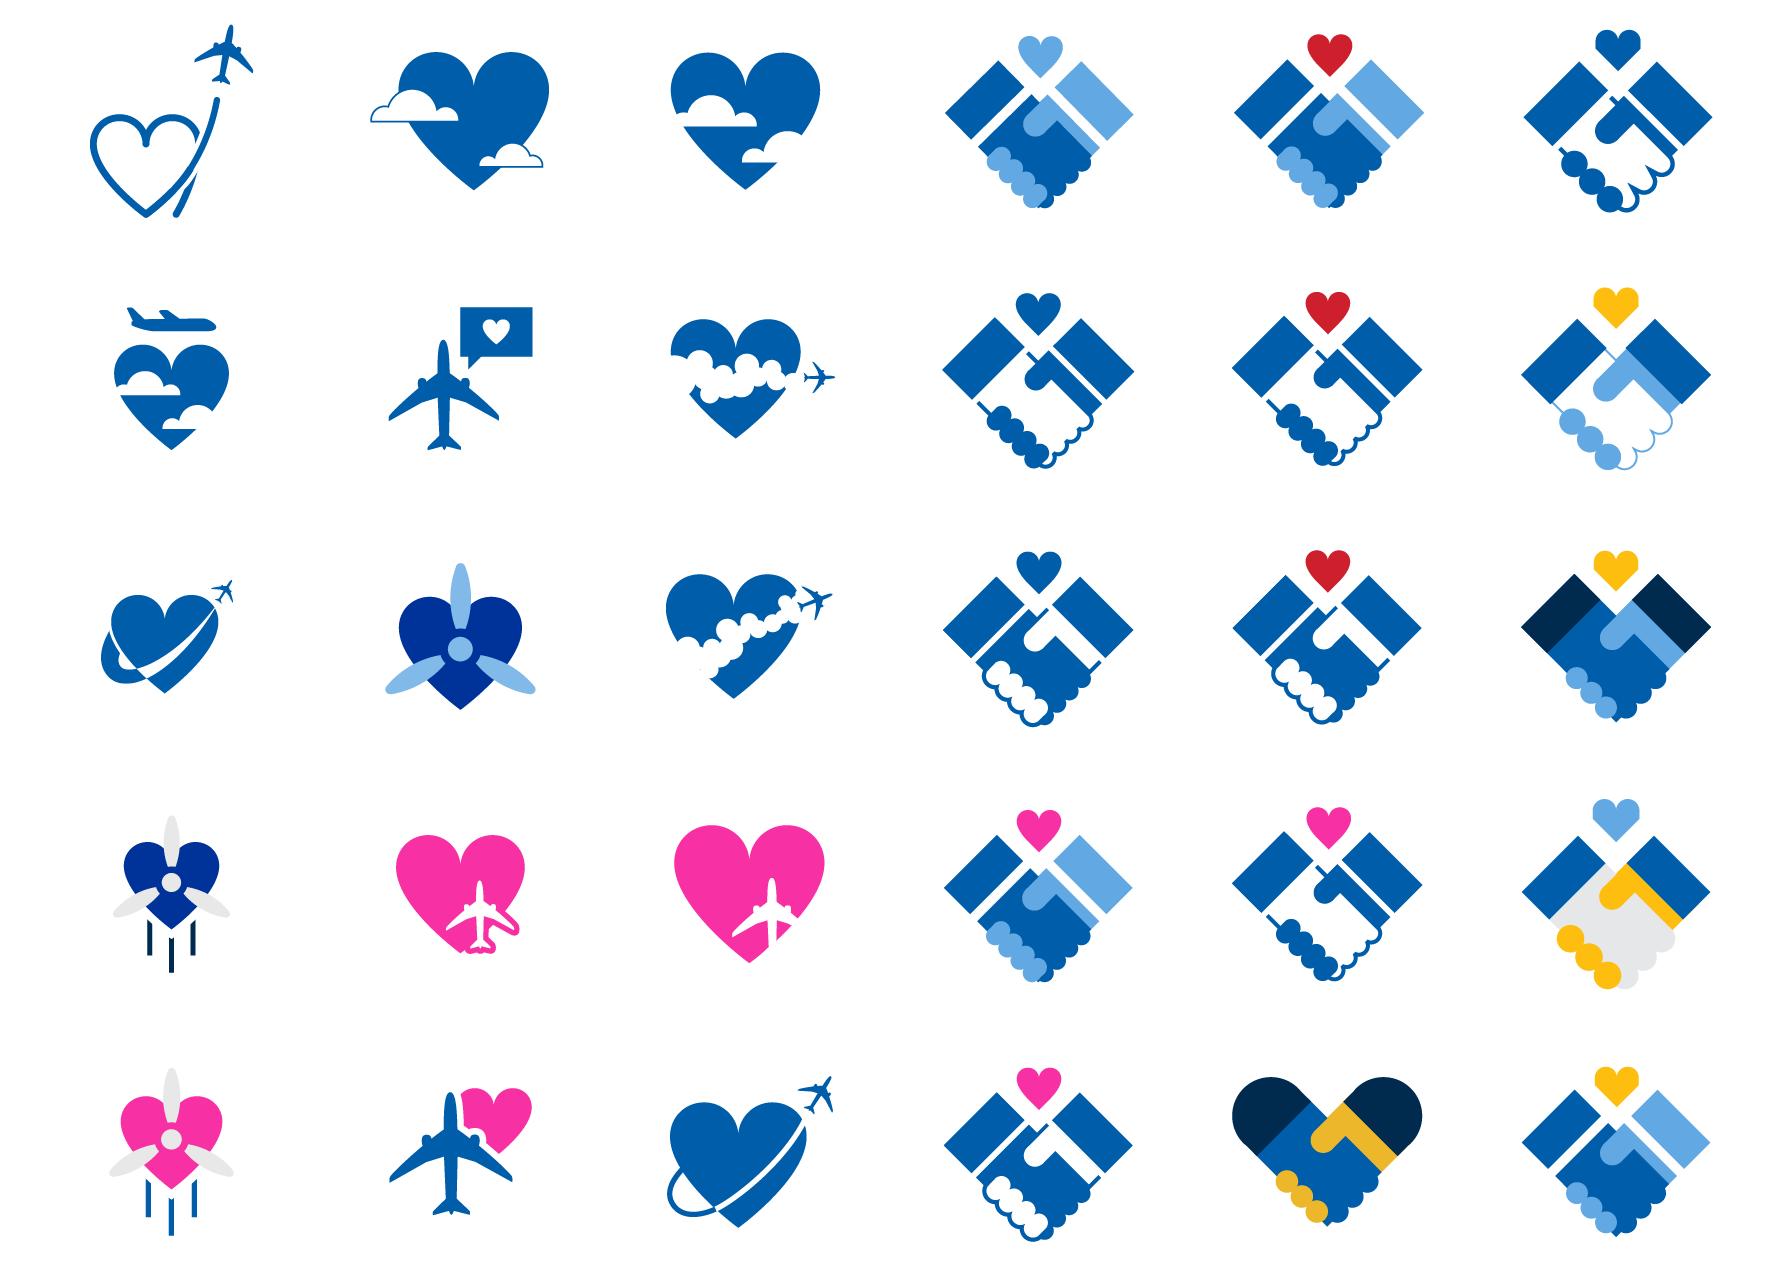 26517_logo_united-beat_alyssa-for-web-01